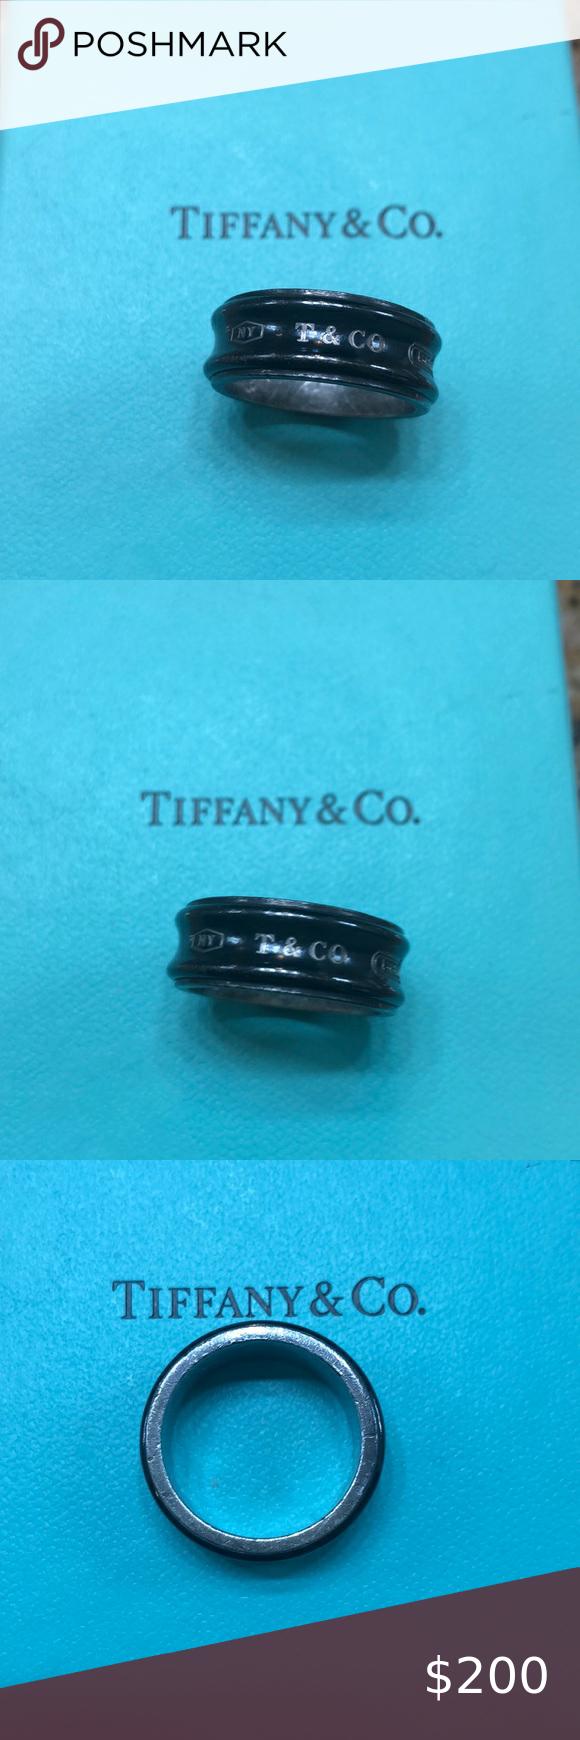 Tiffany Men's Ring size 9 in 2020 Ring size, Mens ring